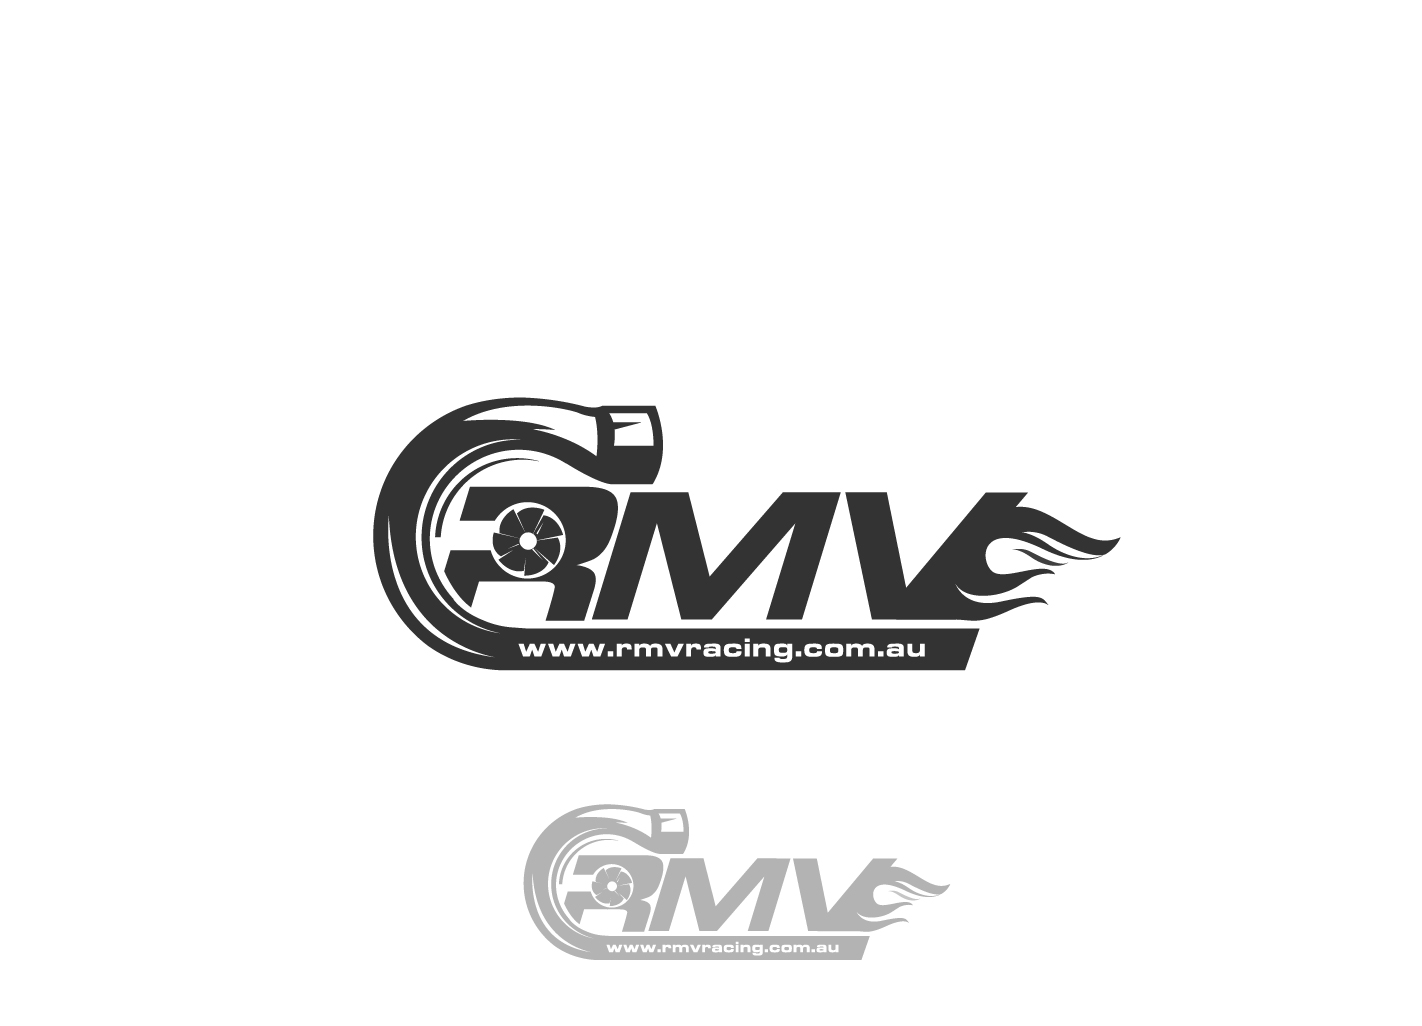 60 Serious Professional Automotive Logo Designs For Rmv